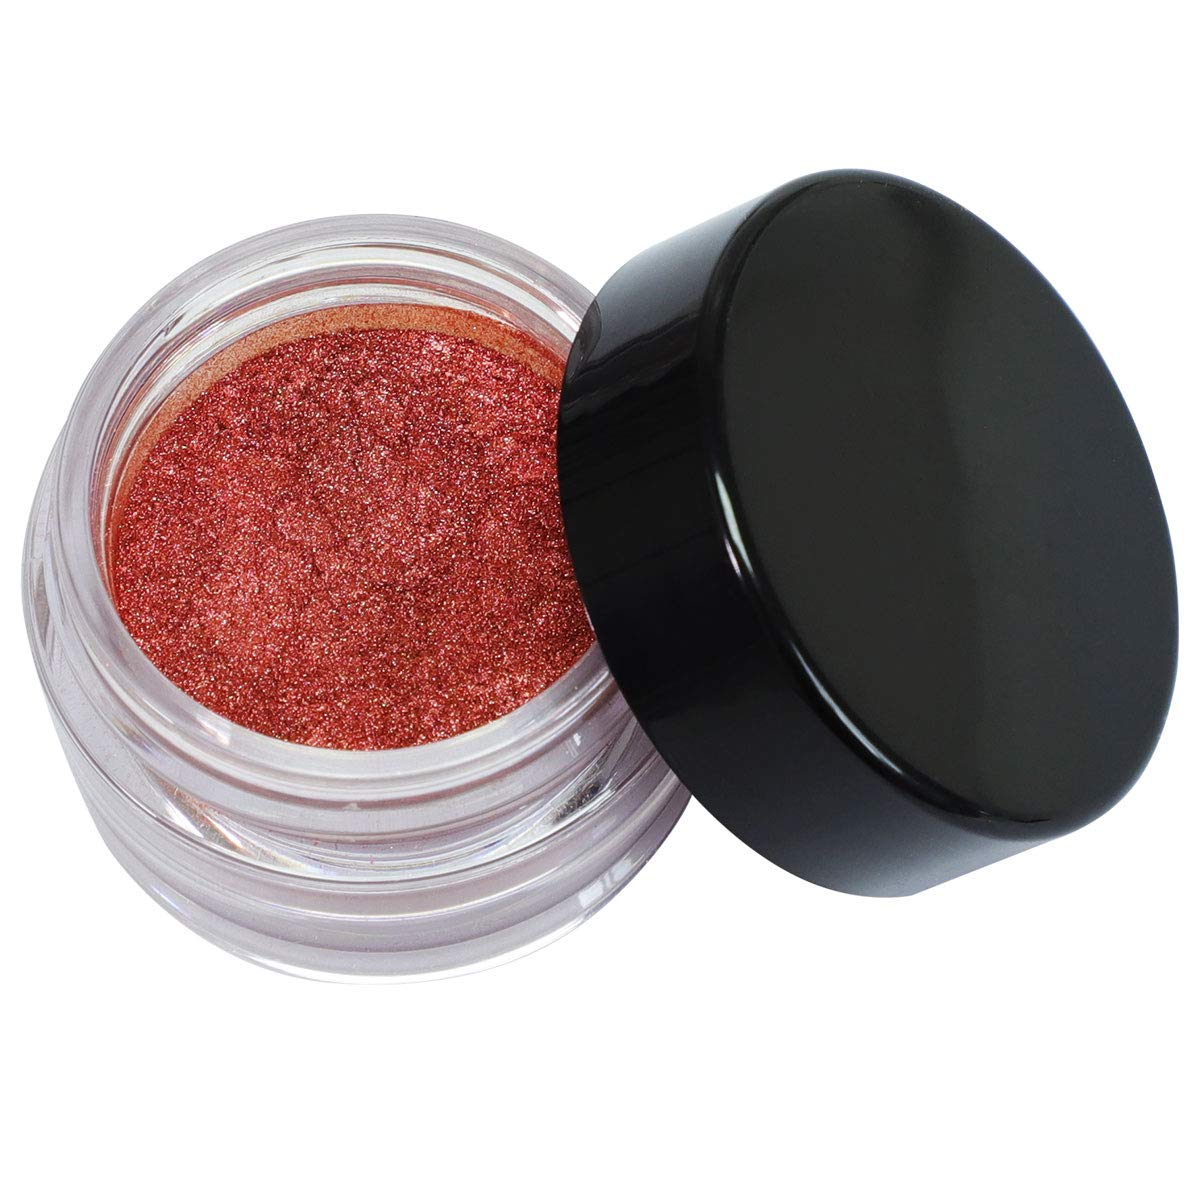 Bright Red Eye Gloss, Cosmetic Grade Mica Powder Pigment for Eyeshadow, Natural Skin Safe for Makeup, Lipgloss, Blush, Lotion, Nail Polish, Soap Making, Bath Bomb, Polish Supplies, Halloween Eyeshadow, 5g\/ 0.17 oz